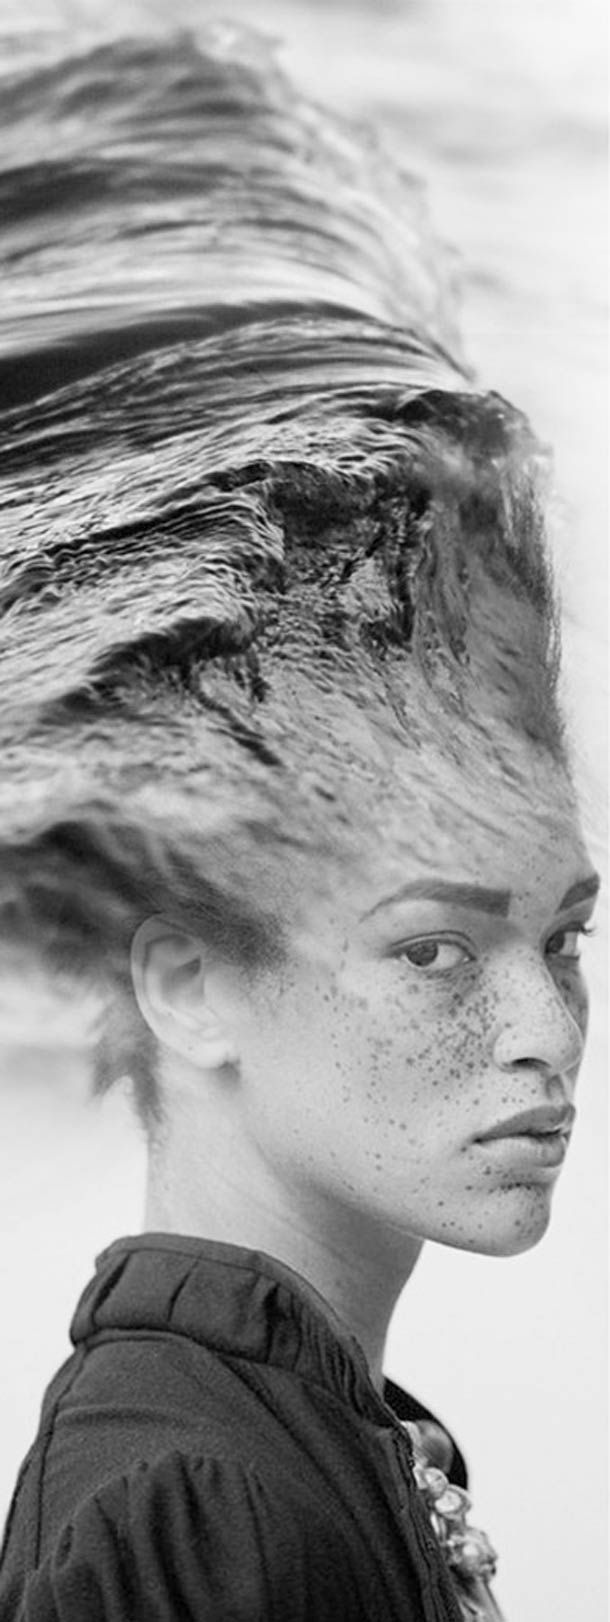 DREAM PORTRAITS – THE SURREAL PORTRAITS BY SPANISH ARTIST ANTONIO MORA.